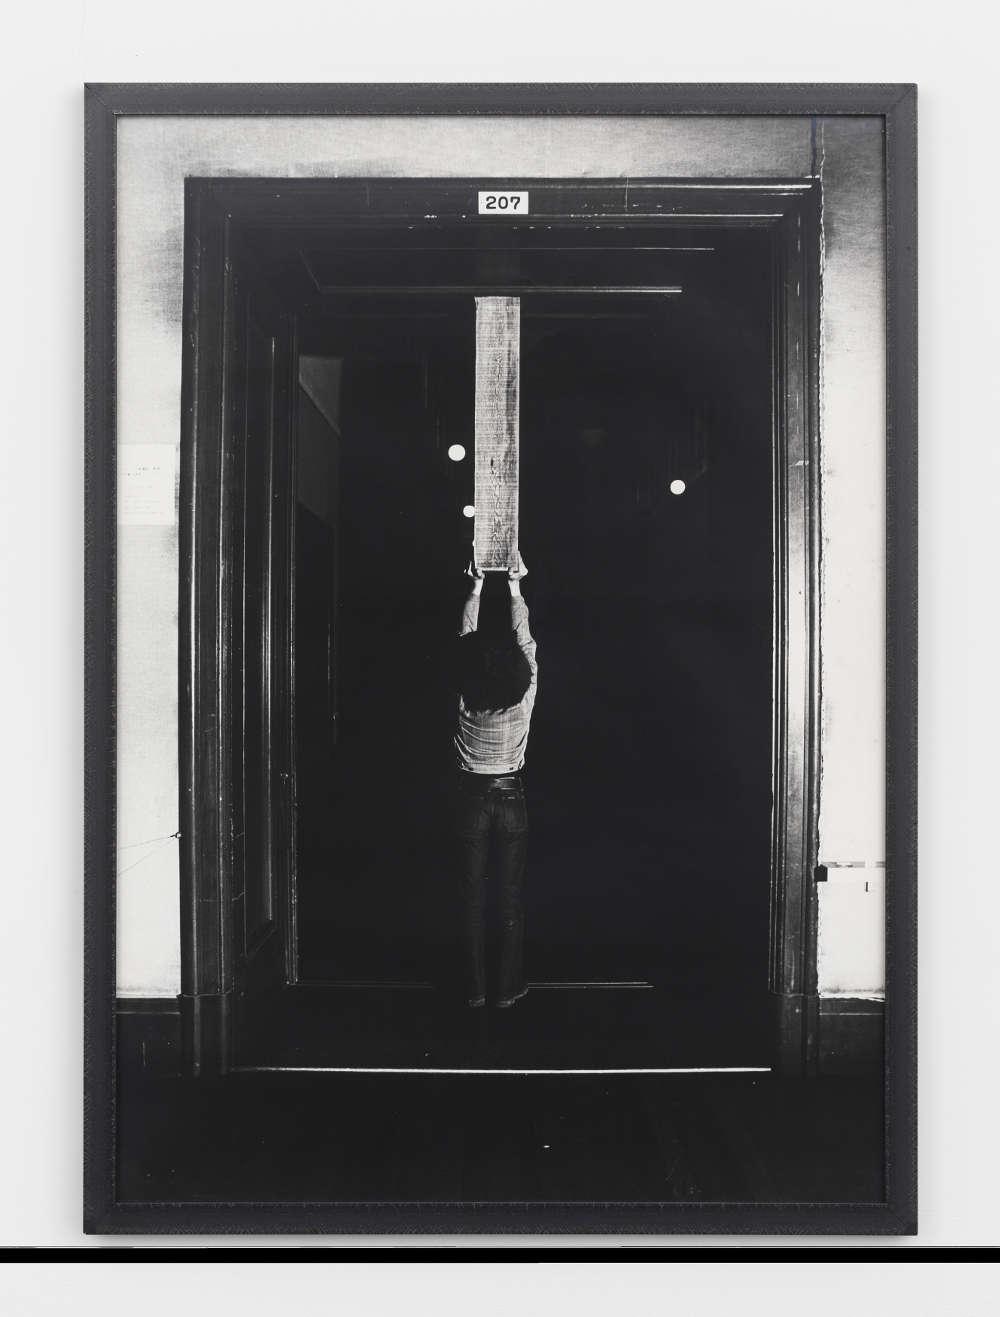 Keiji Uematsu, Vertical Position, 1973. Gelatin silver print, unique, vintage 102.4 x 72.4 cm (40 1/4 x 28 1/2 in.) Courtesy the artist and Simon Lee Gallery